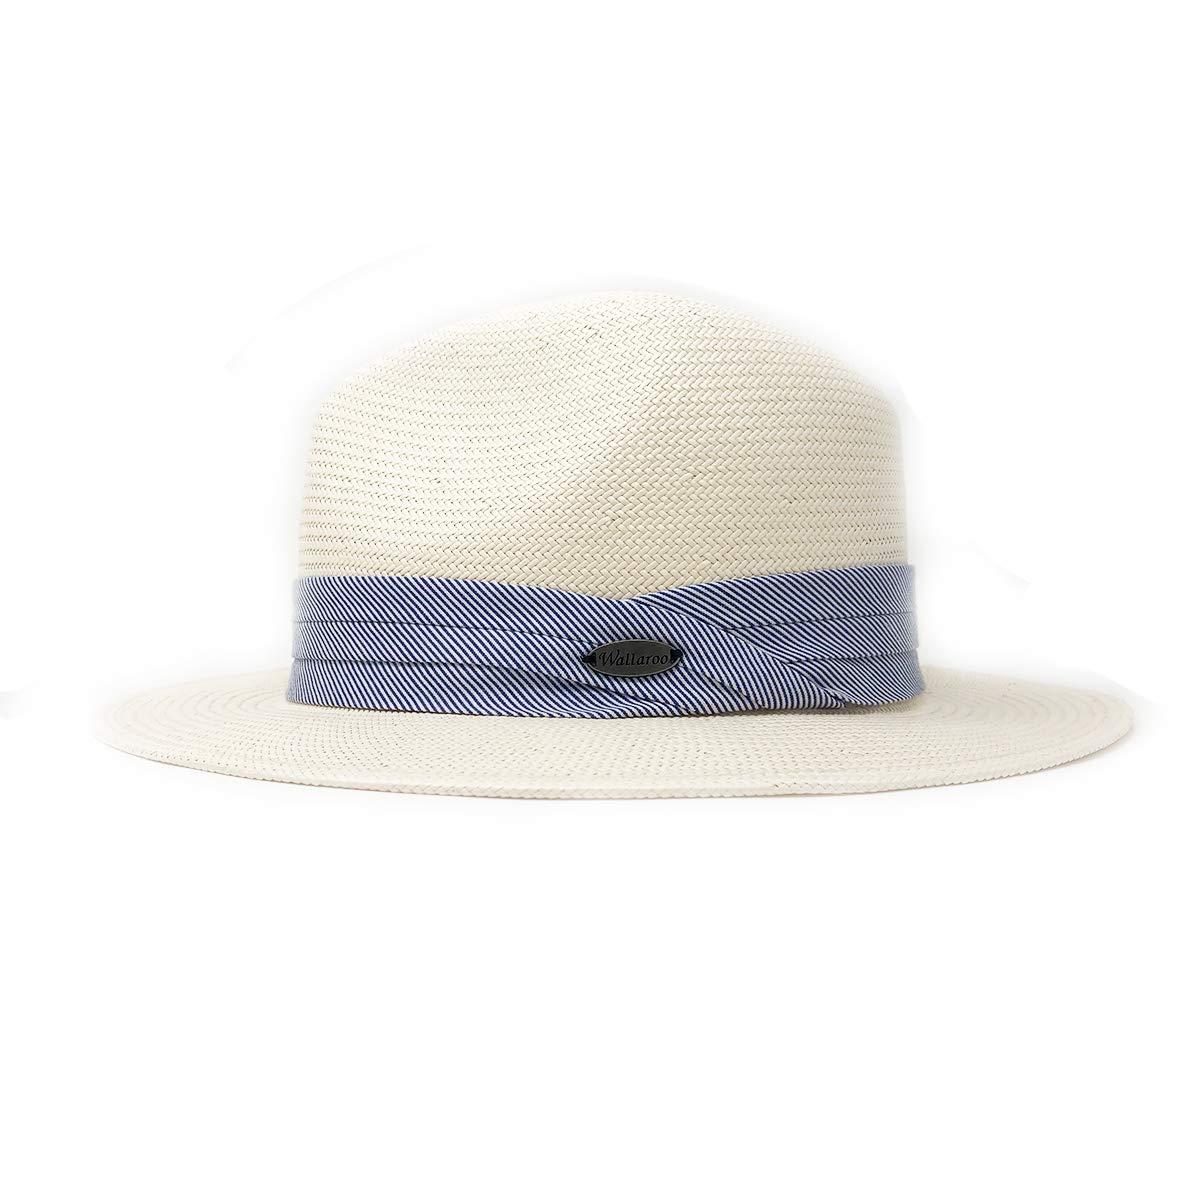 Wallaroo Hat Company Women's Monterey Fedora - Natural - Elegant Fedora, Modern Style by Wallaroo Hat Company (Image #2)